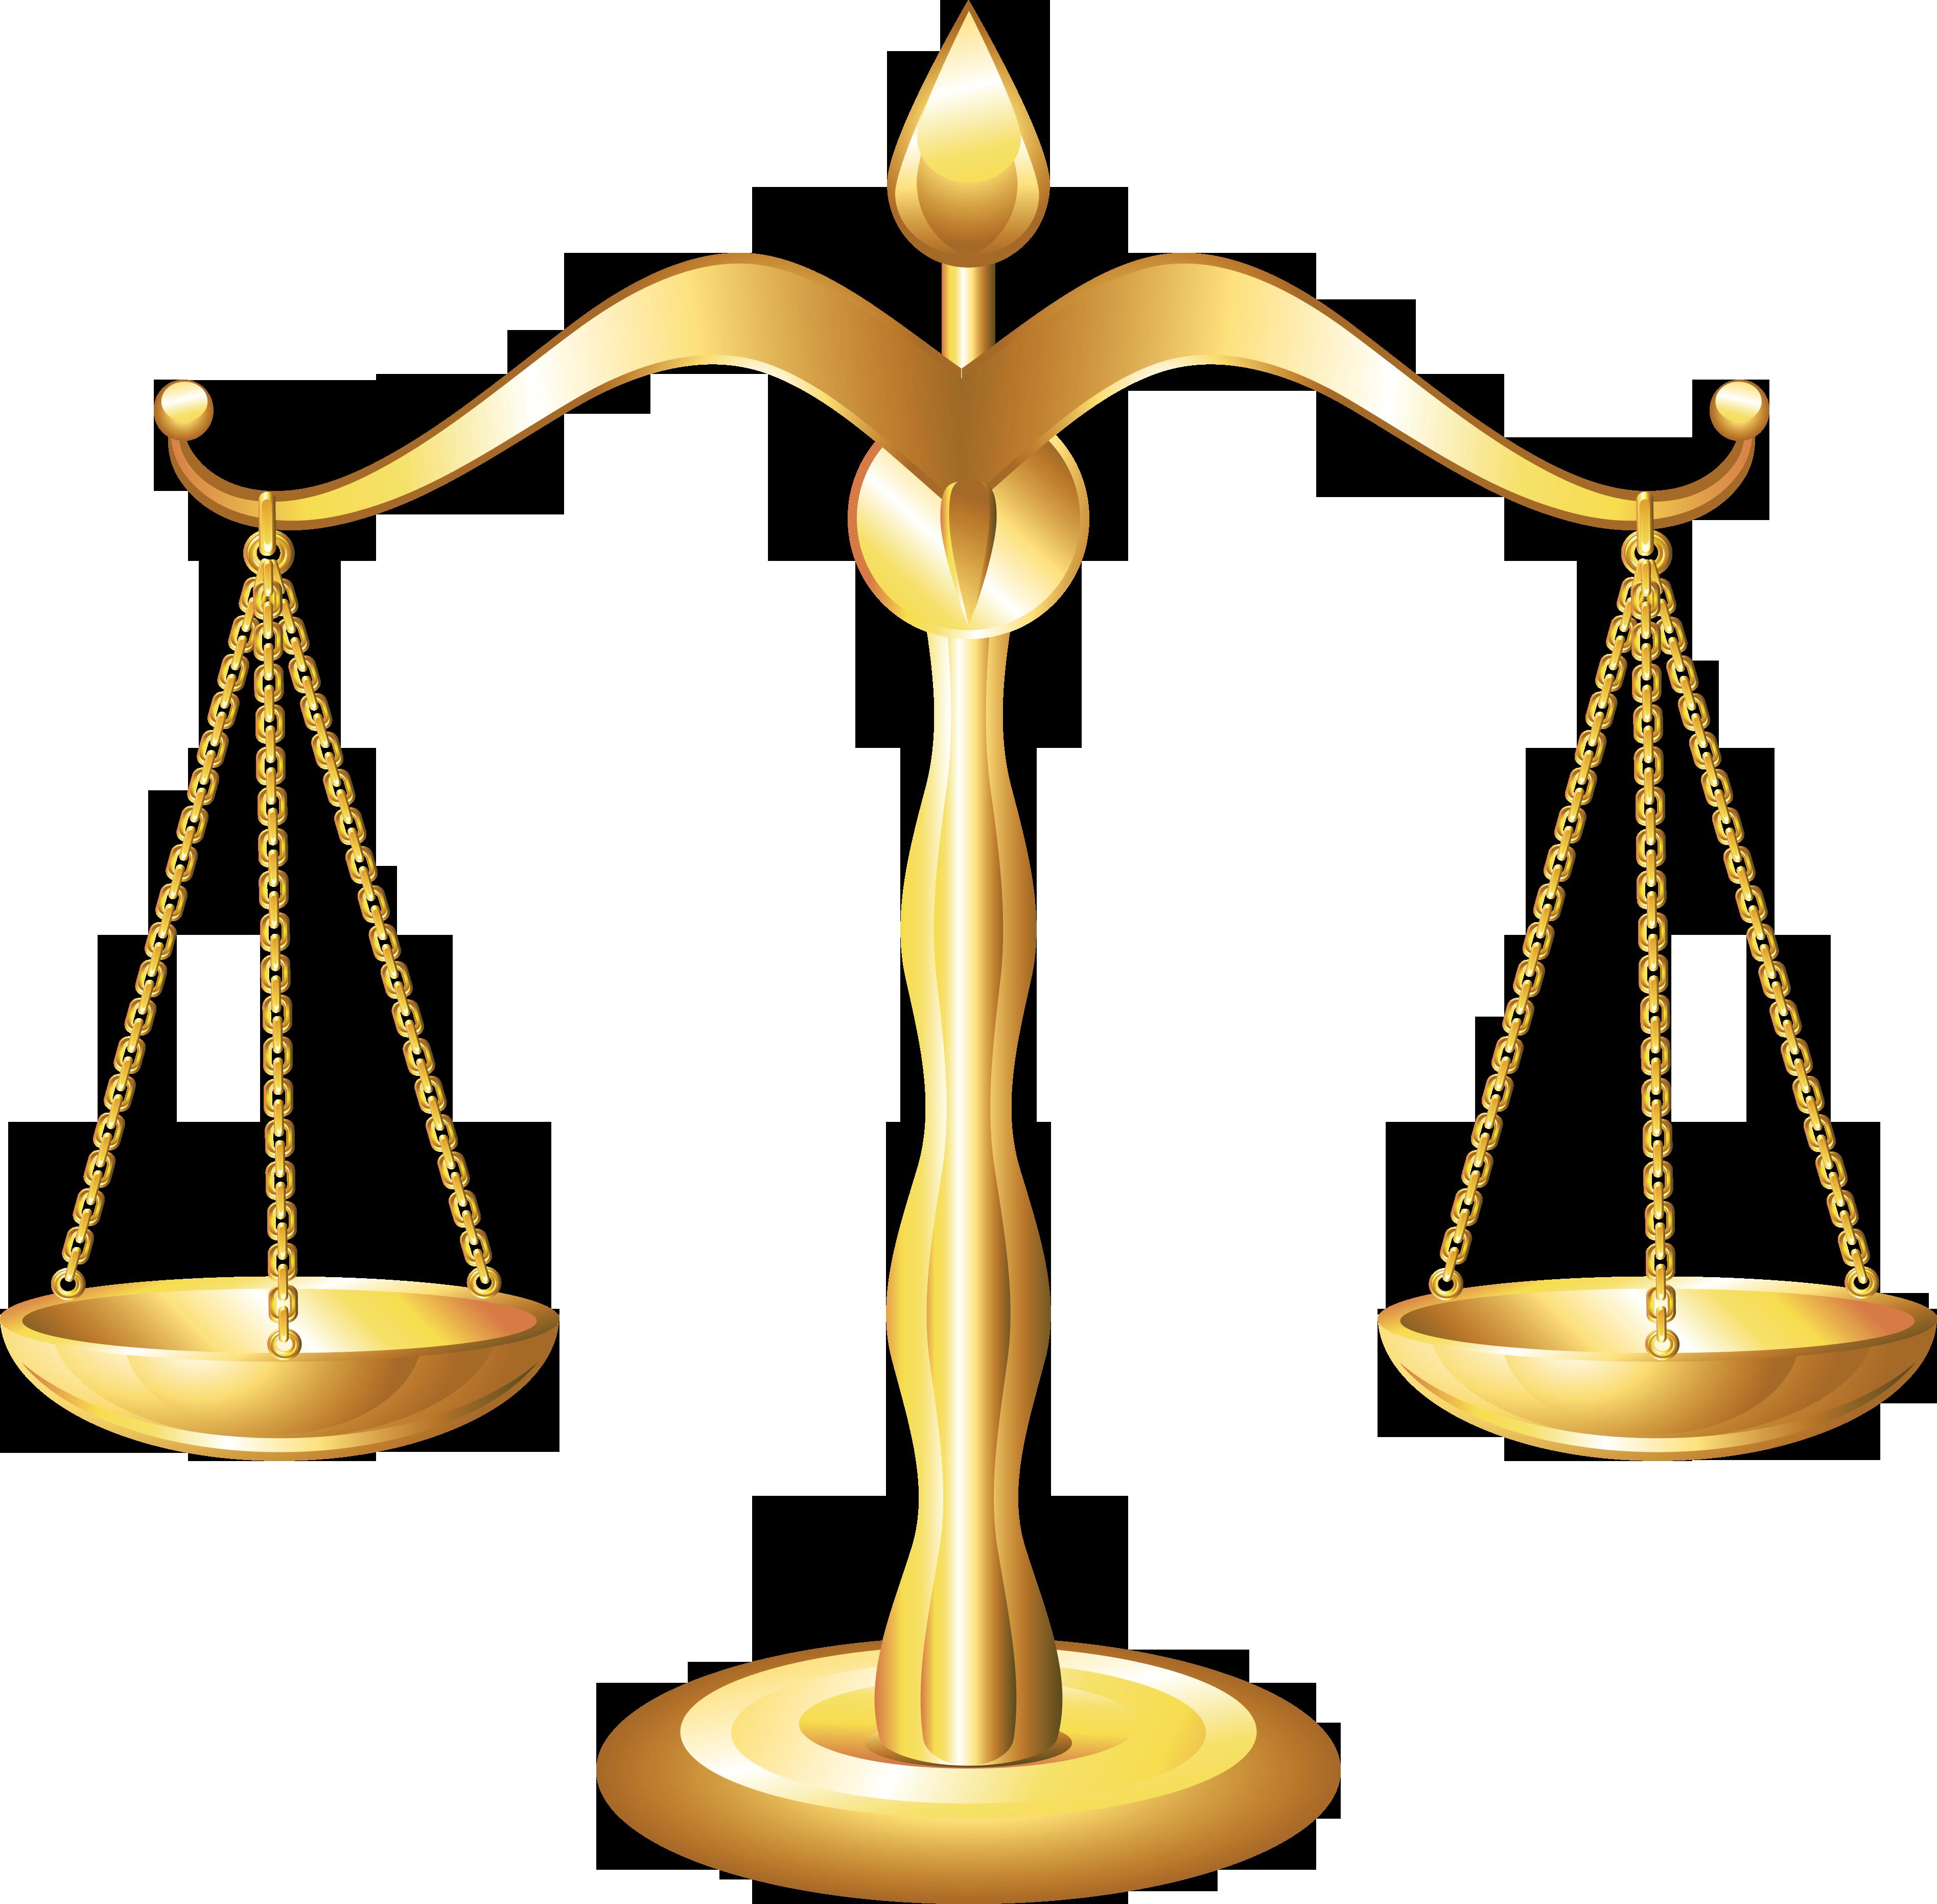 Правосудие рисунок 6